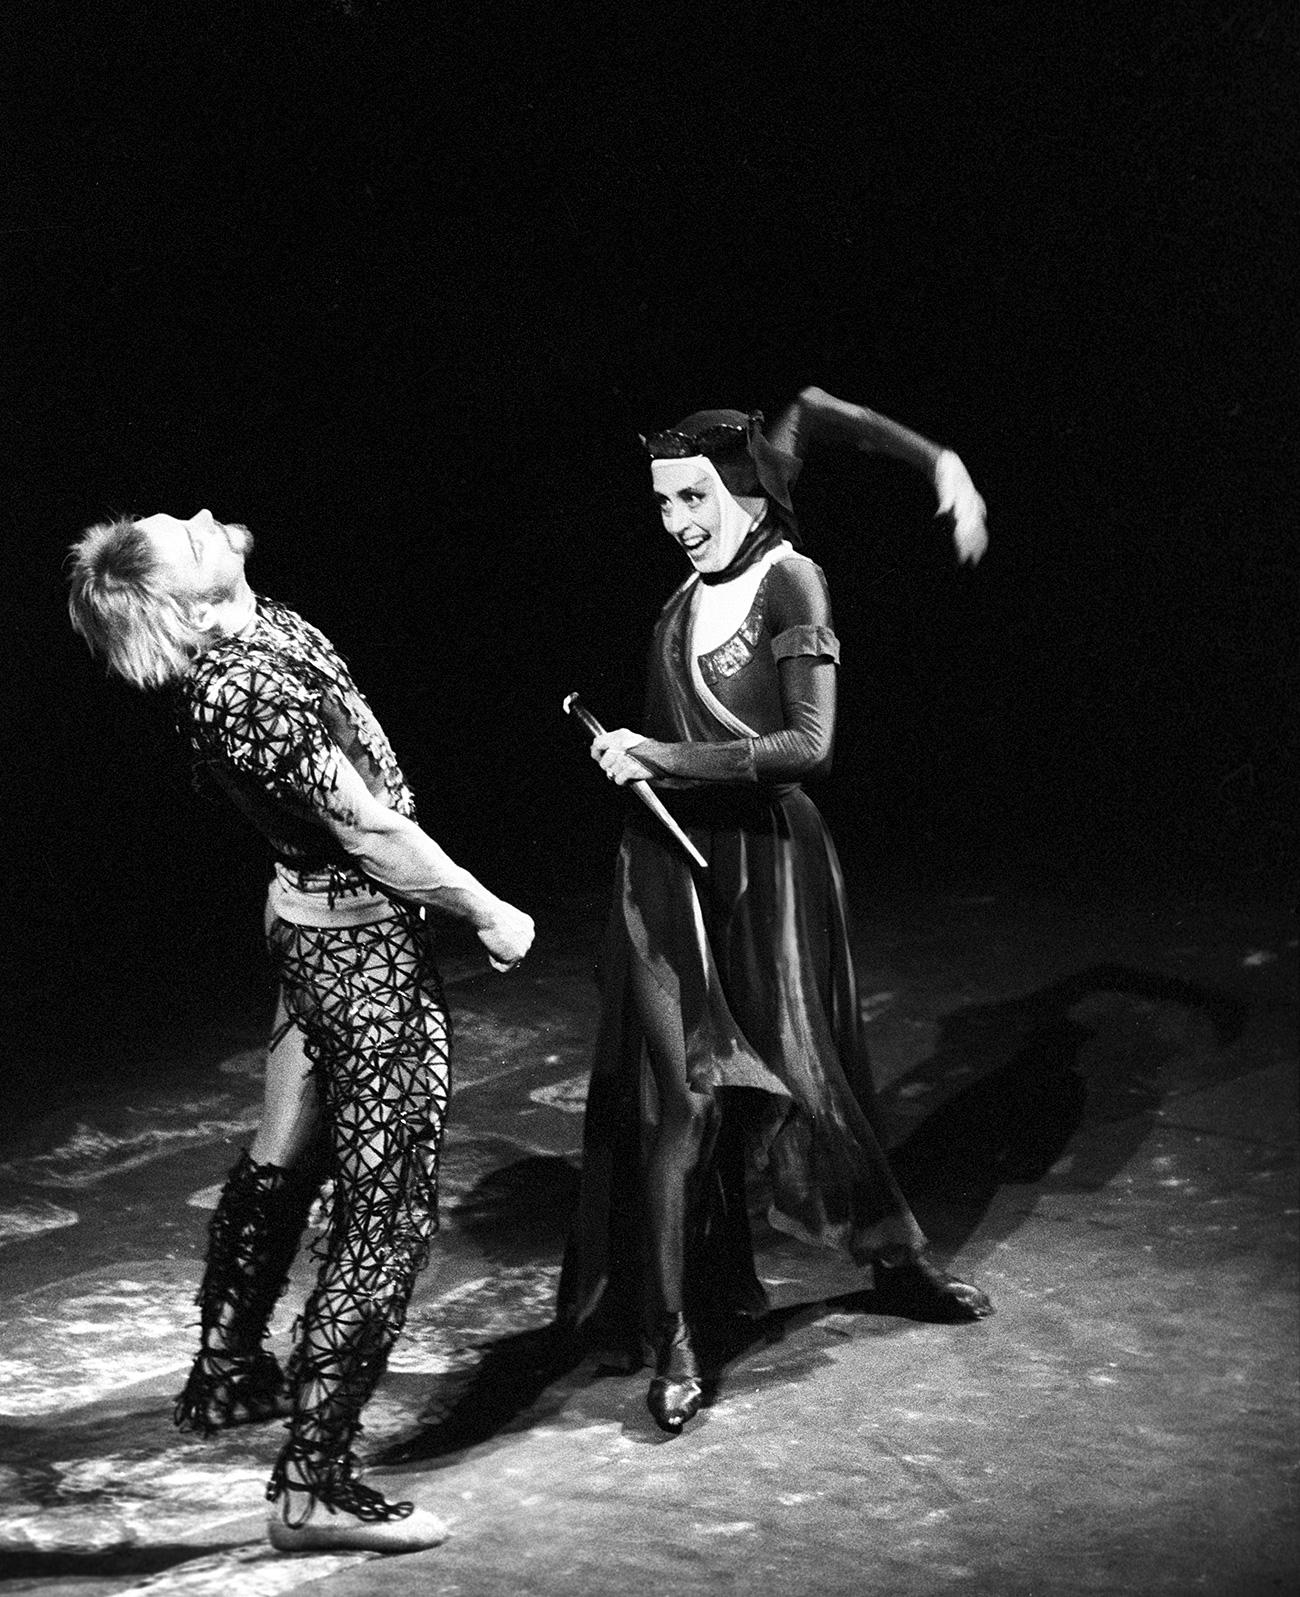 El Teatro Académico del Bolshói. Vladímir Vasíliev como Macbeth, Nina Timoféieva como Lady Macbeth. Fuente: Alexánder Makárov/RIA Nóvosti